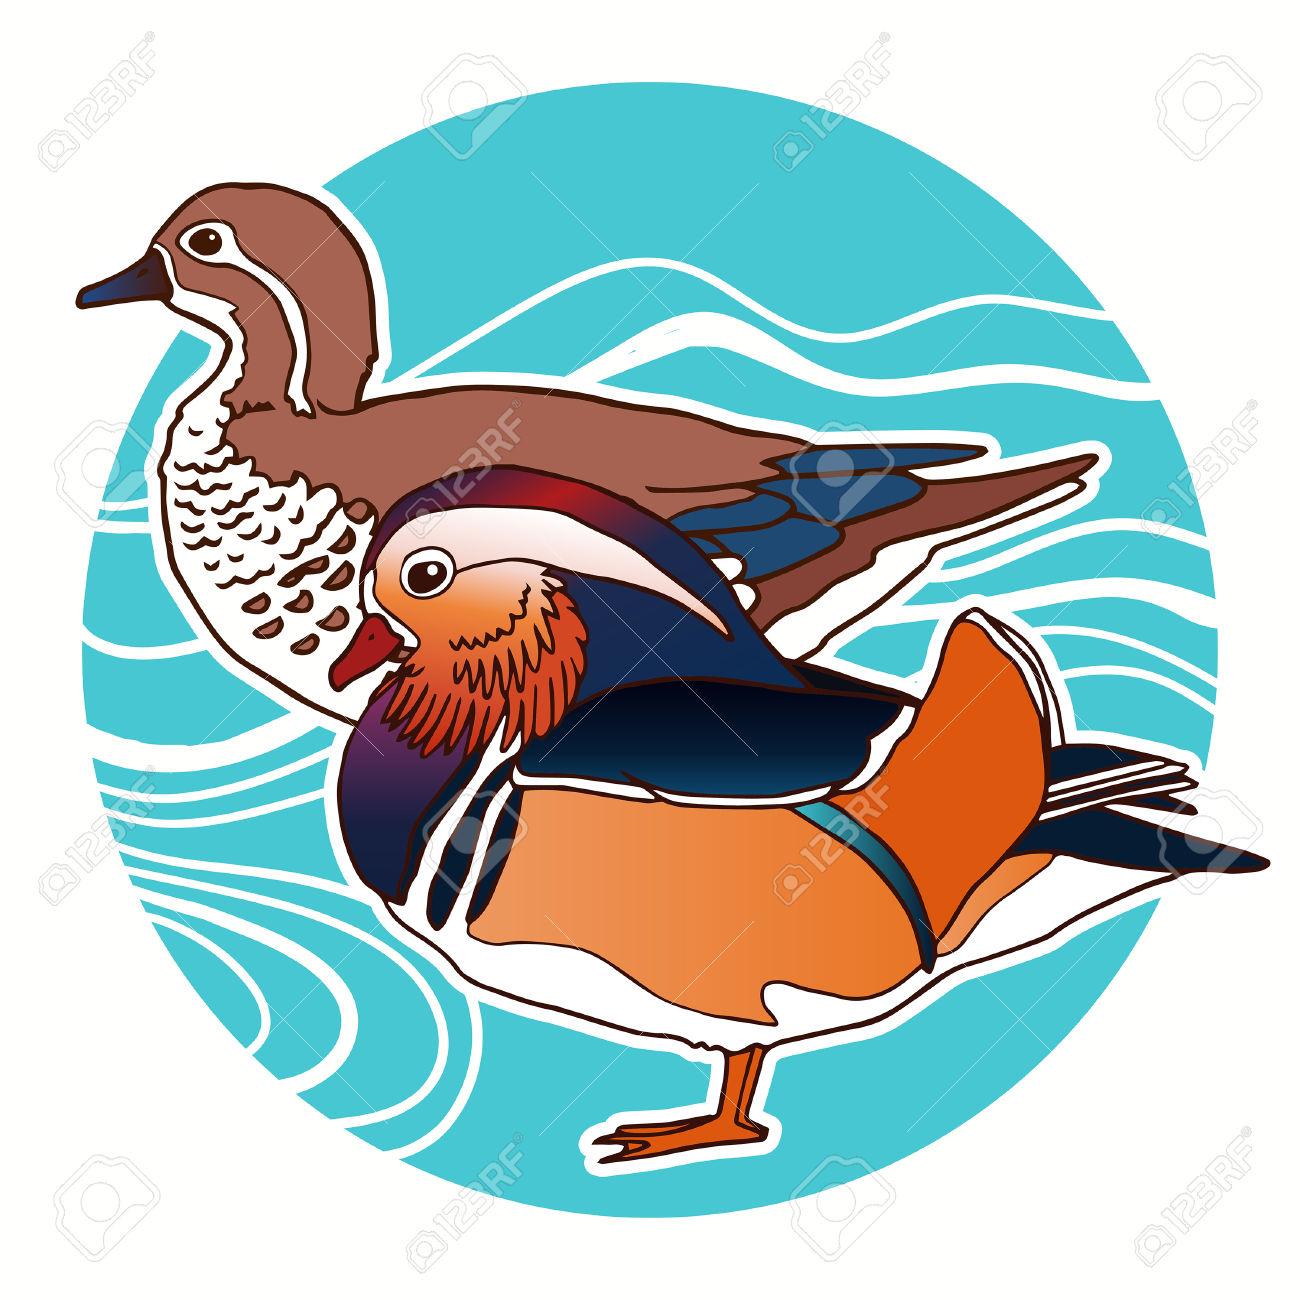 Mandarin Duck Vector Illustration Royalty Free Cliparts, Vectors.